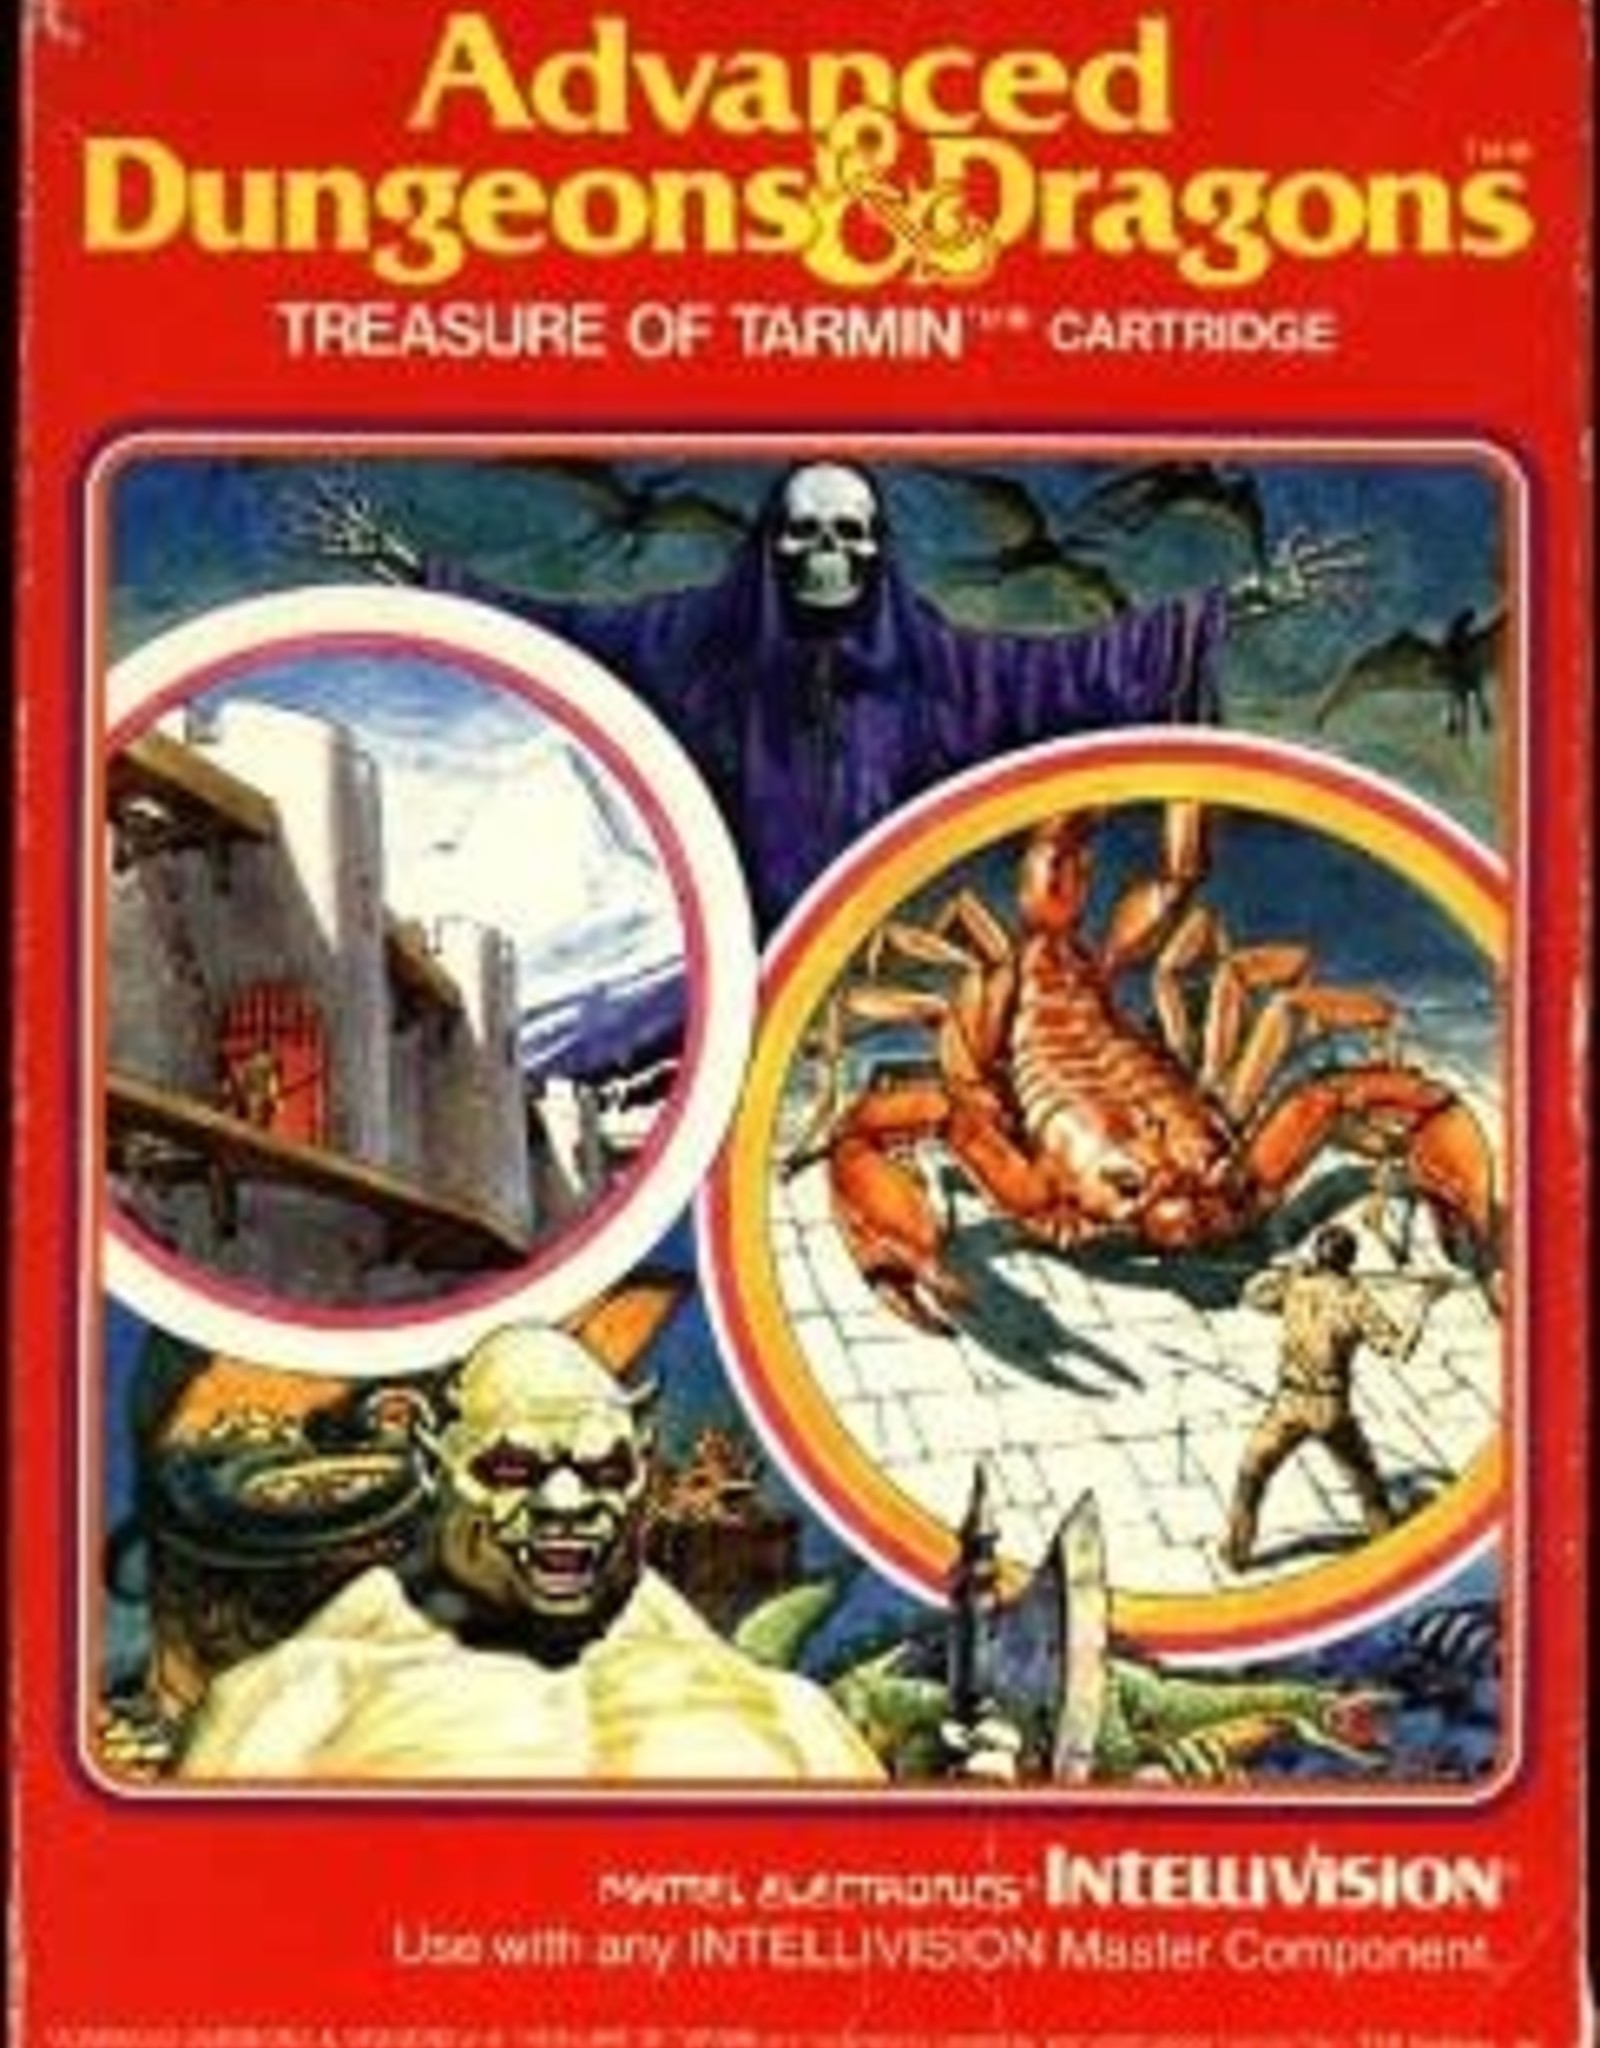 Intellivision Advanced Dungeons & Dragons: Treasure of Tarmin (CIB)